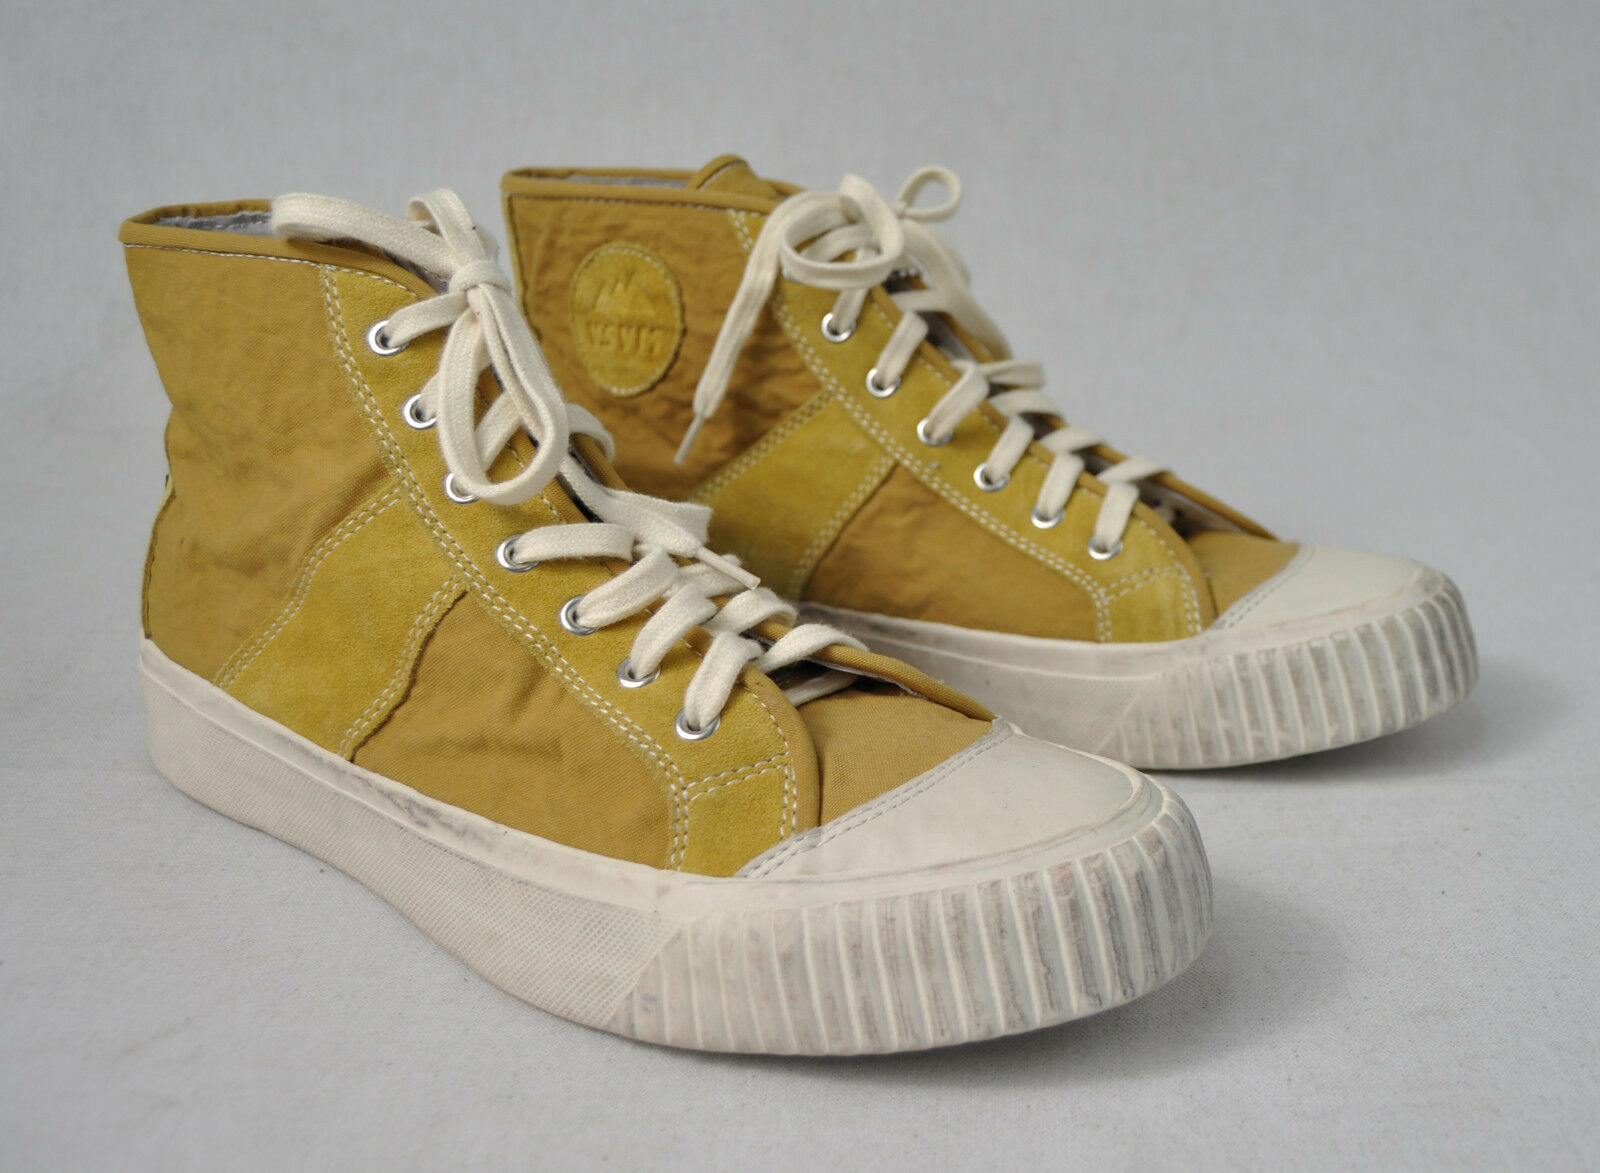 Visvim Leisee Lamina Studded oroen giallo scarpe 11 Mens New